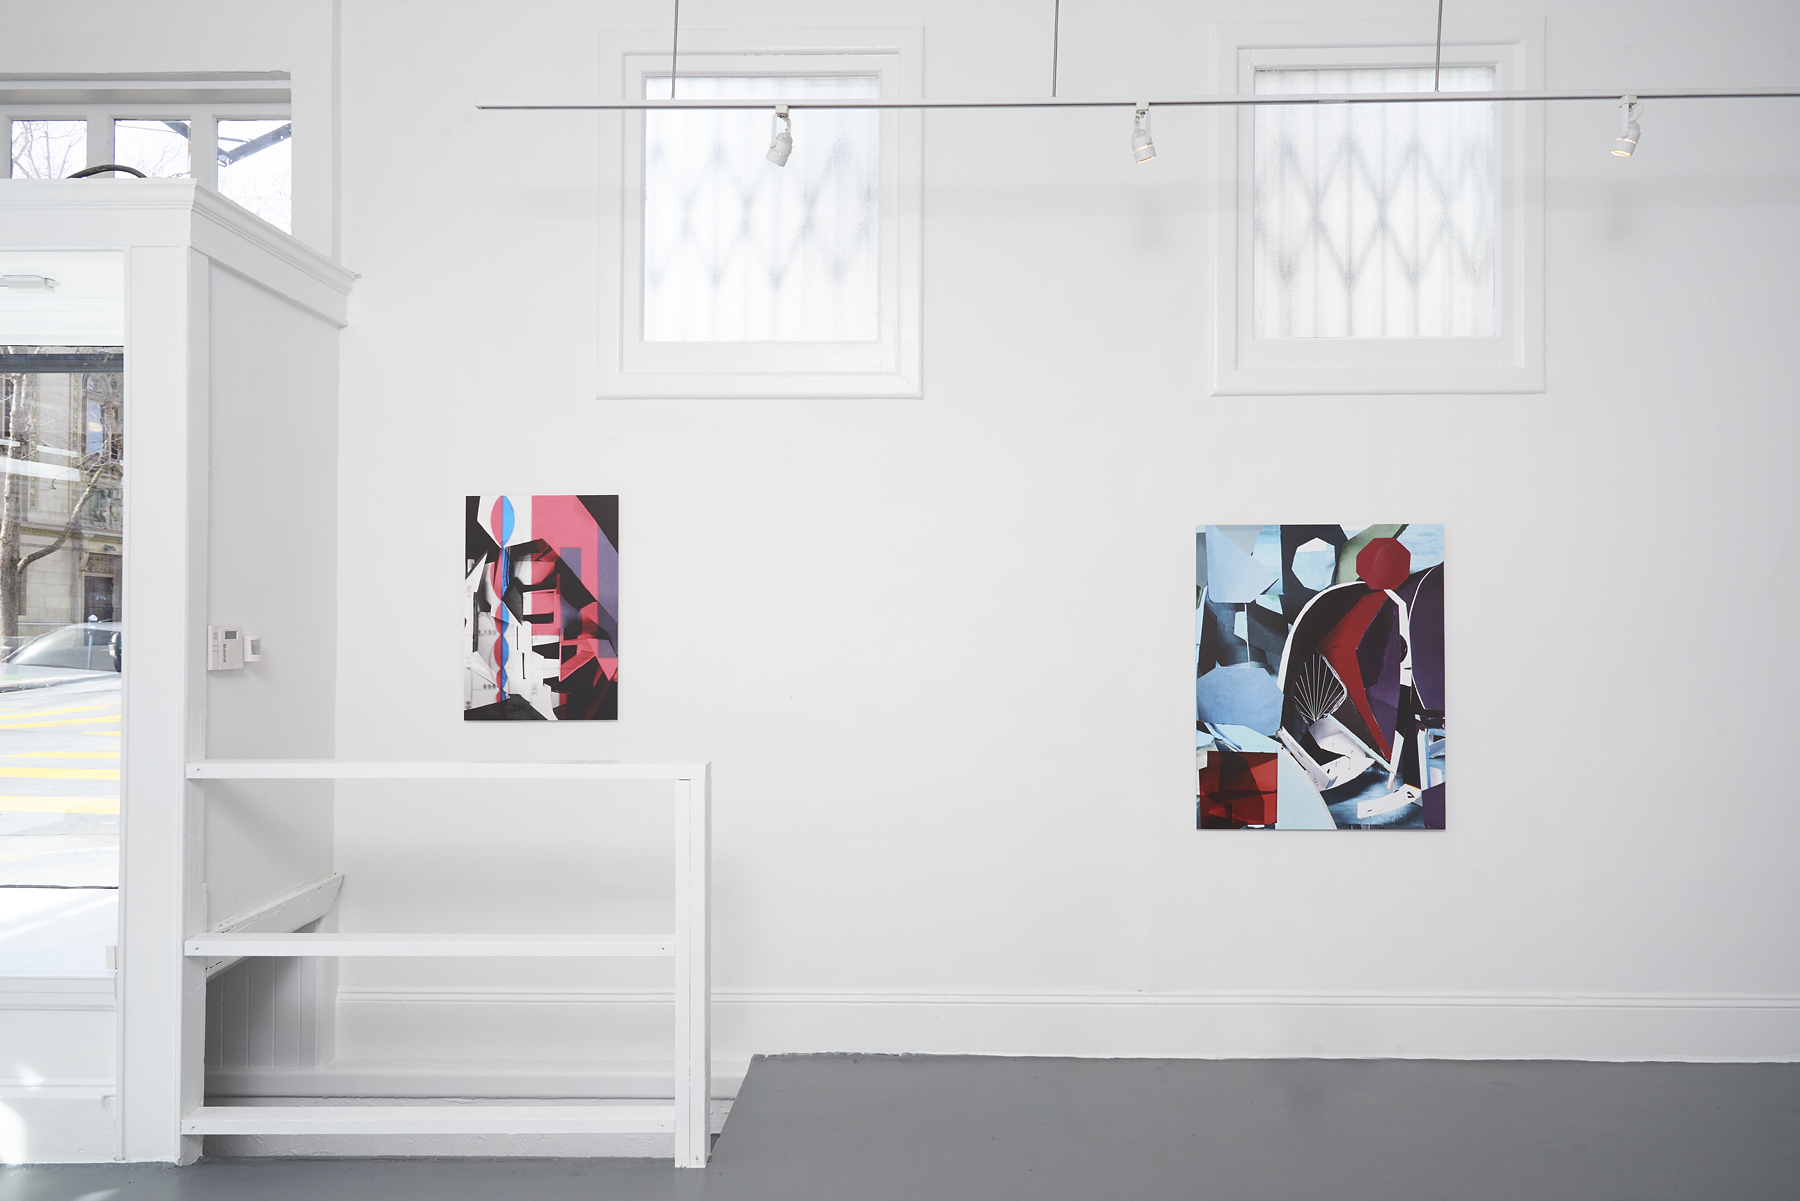 Yamini Nayar, 'If stone could give,' installation view, Gallery Wendi Norris Offsite, 3344 24th Street, San Francisco.  (Photo: John Wilson White / Studio Phocasso)